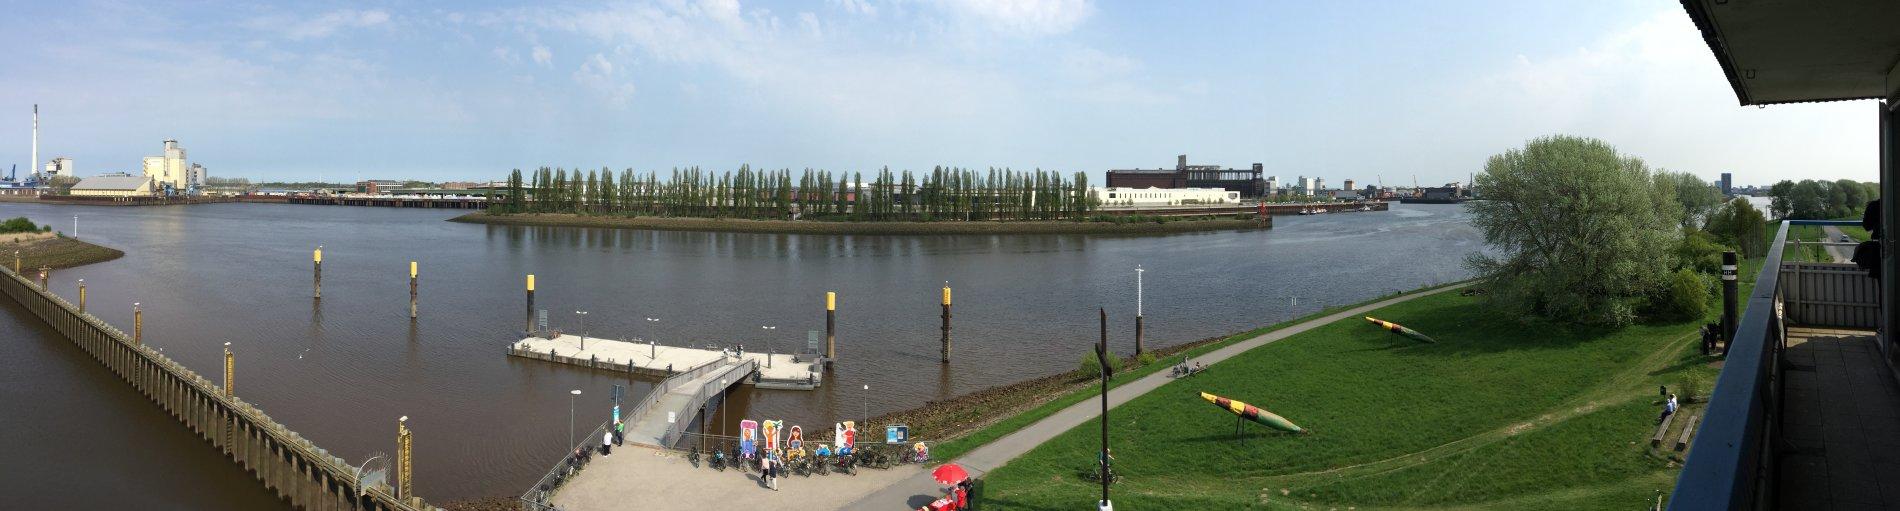 Panorama Blick auf die Weser